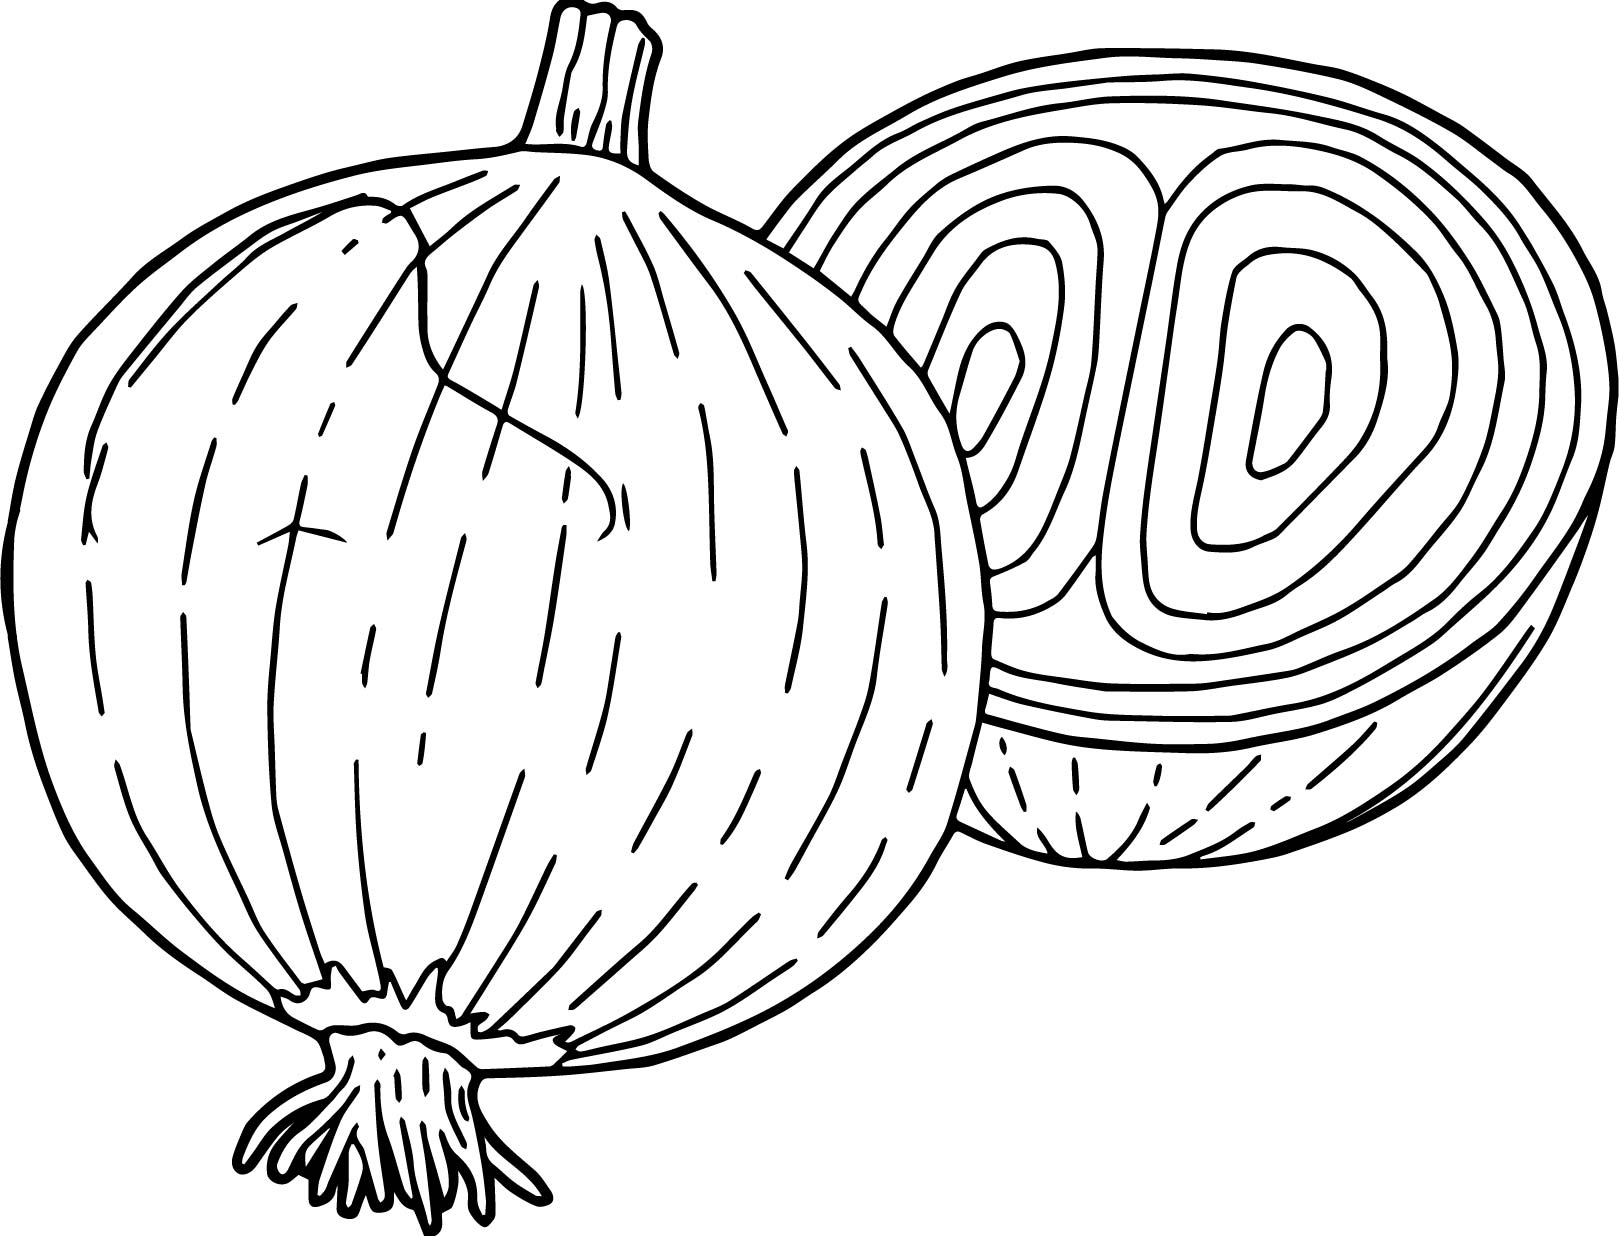 Onion Drawing at GetDrawings